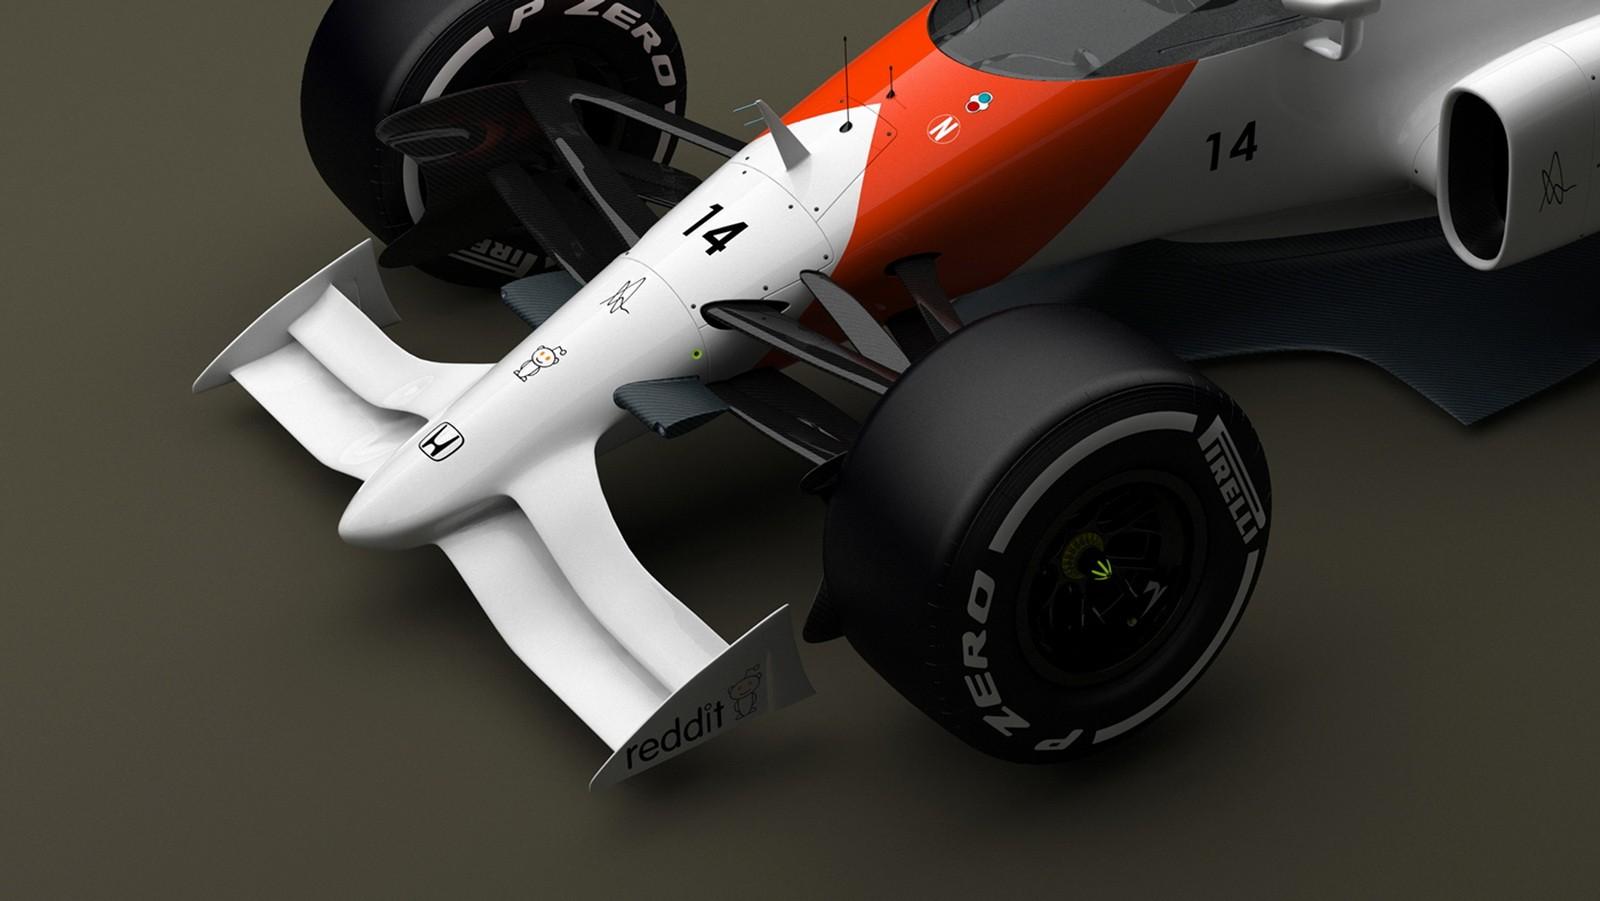 future-formula-1-concept-earns-closed-cockpit-honda-mclaren-livery-photo-gallery_8